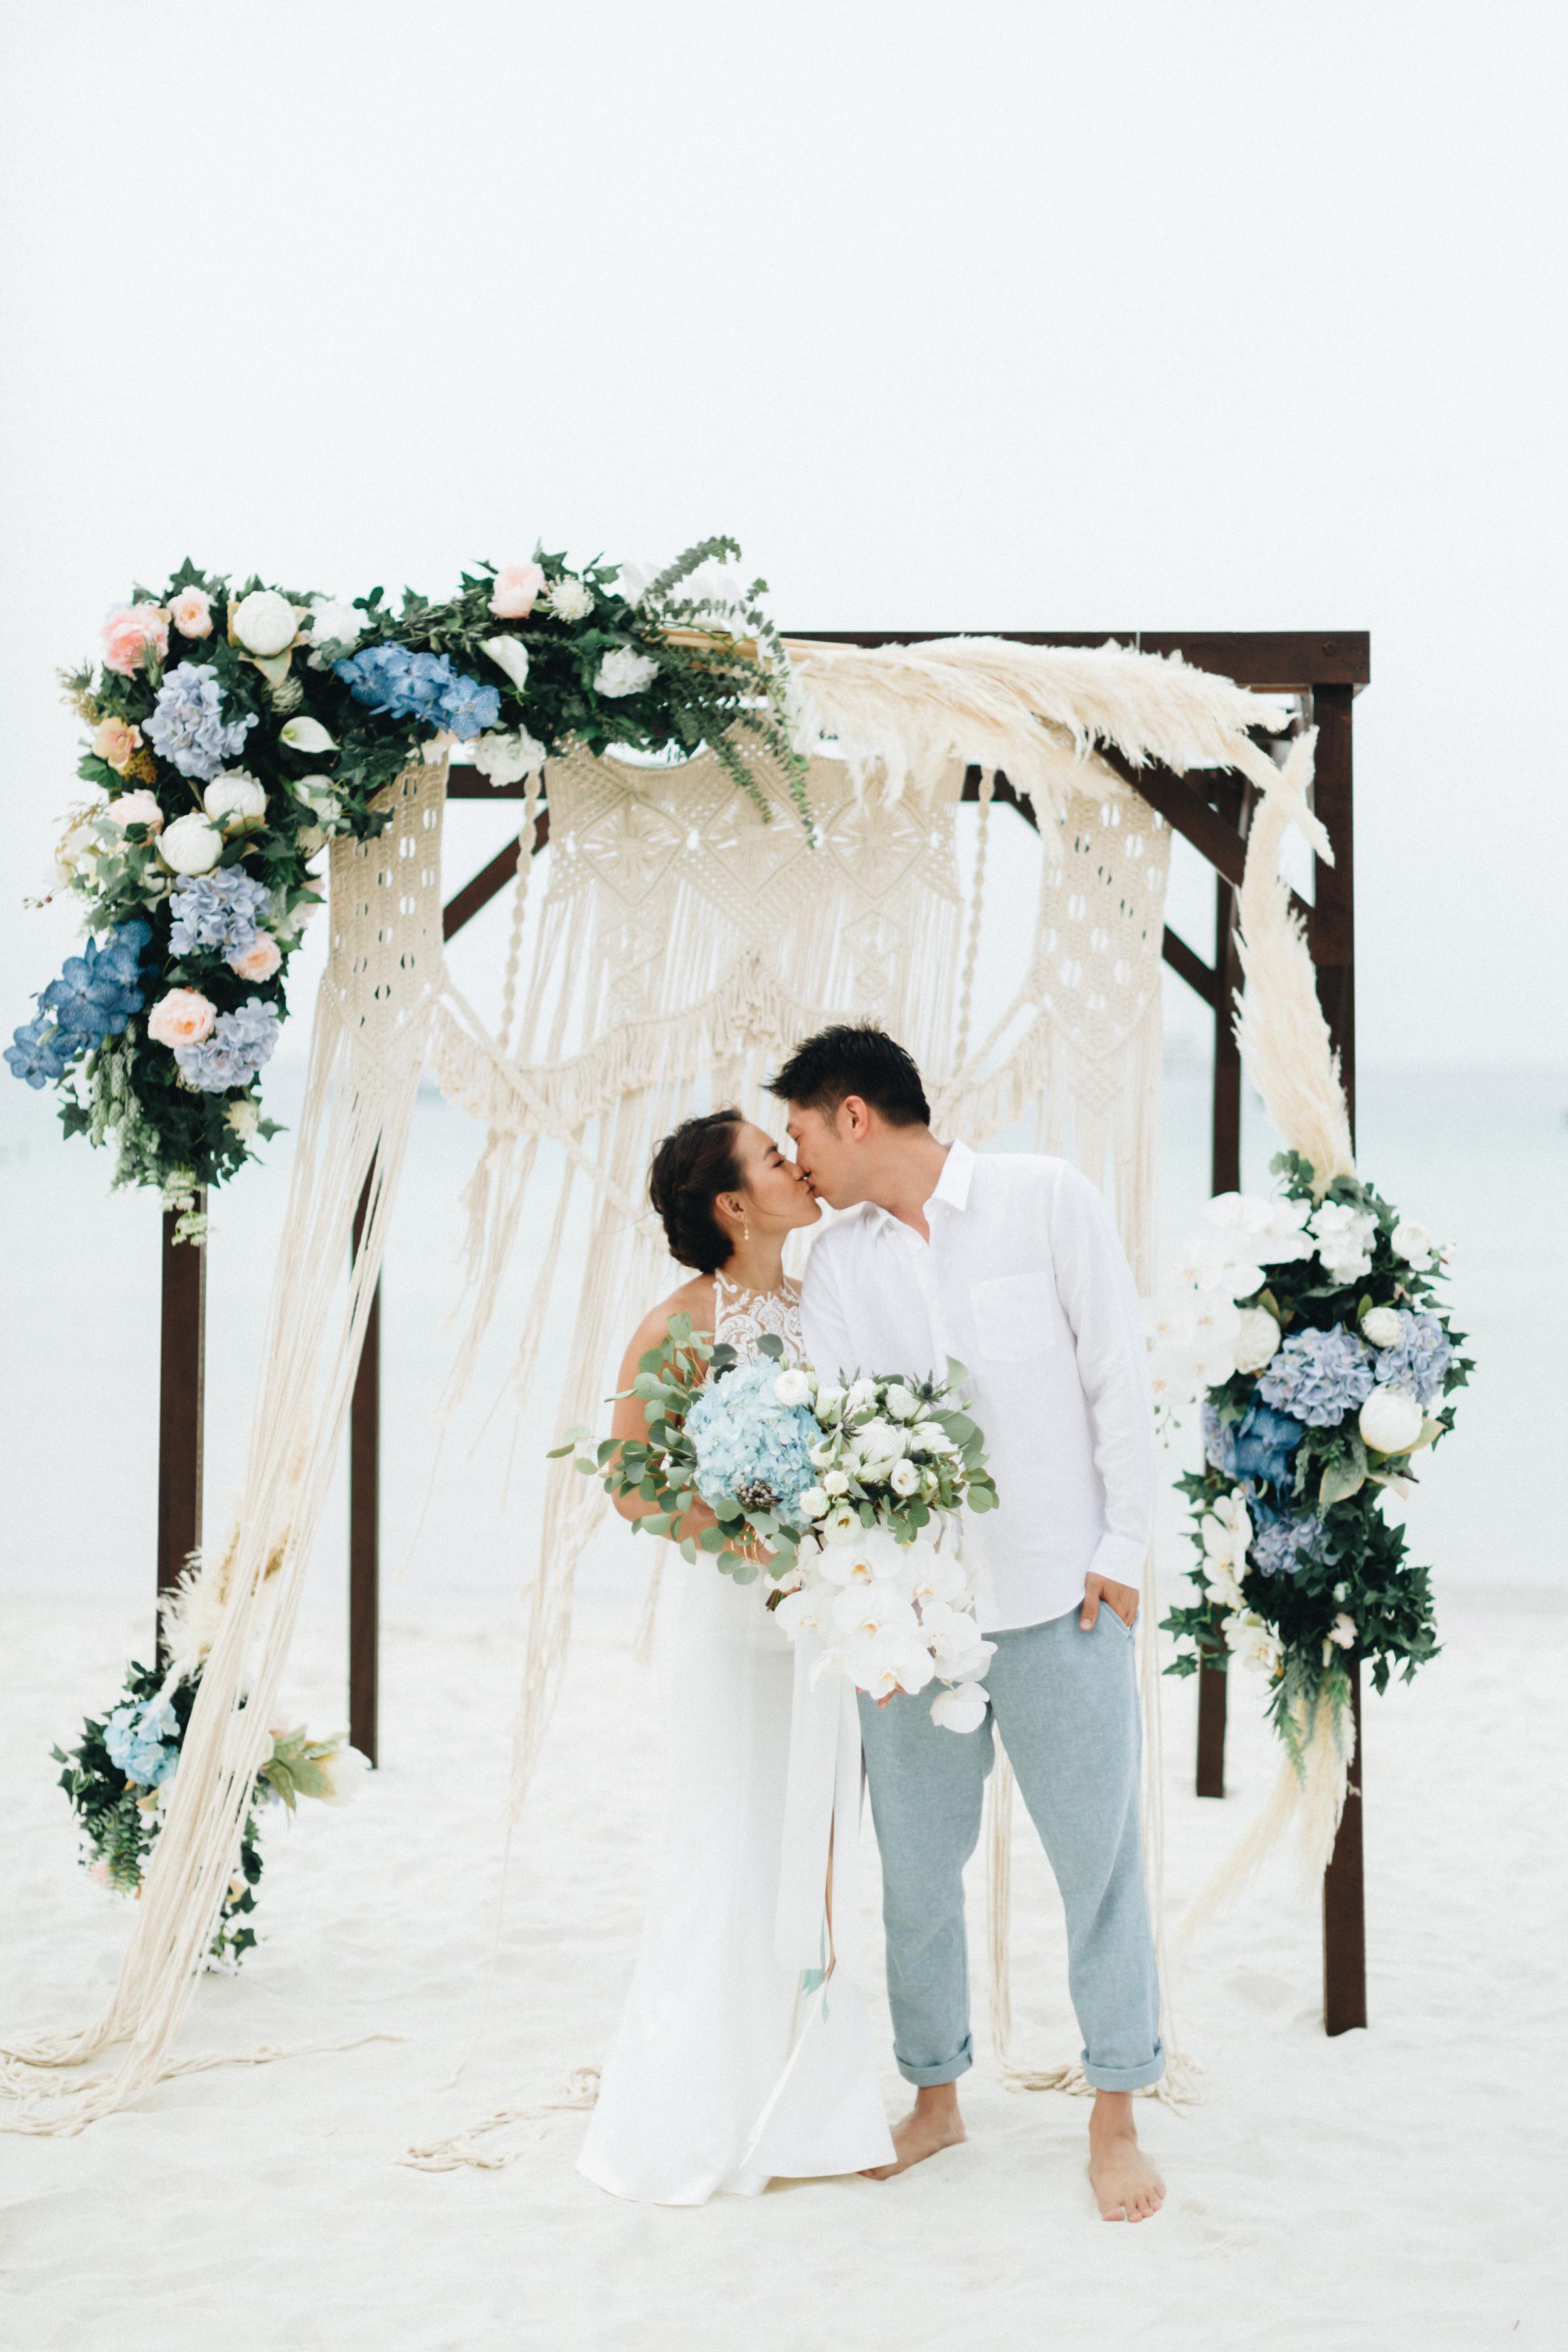 CHARLENE + CALVIN - Beach Wedding at Taarast Resort, Redang